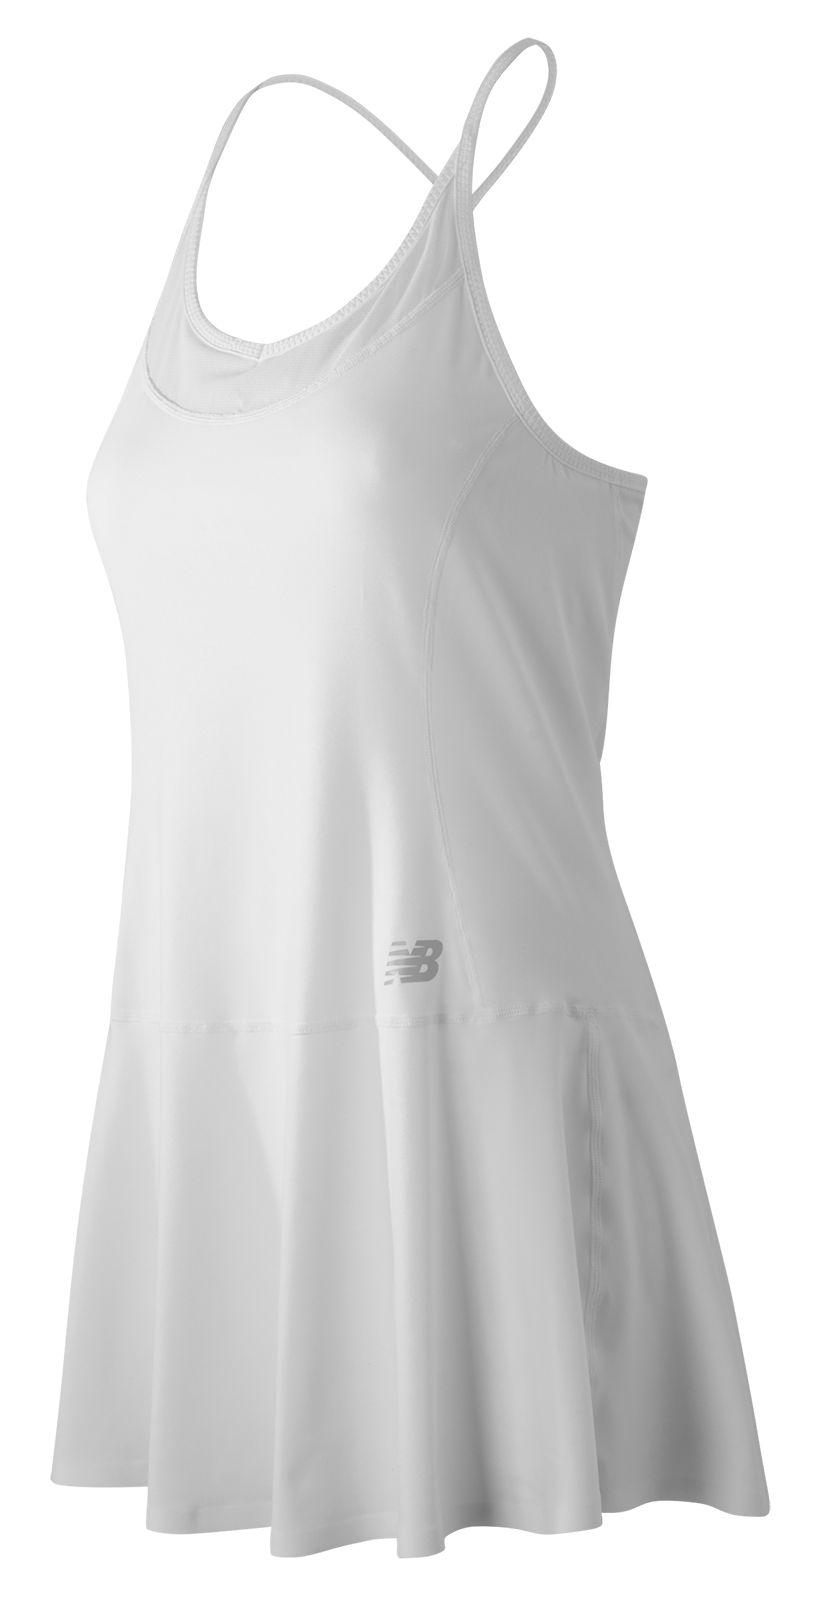 New Balance : Tournament Dress : Women's Apparel : WD61416WT